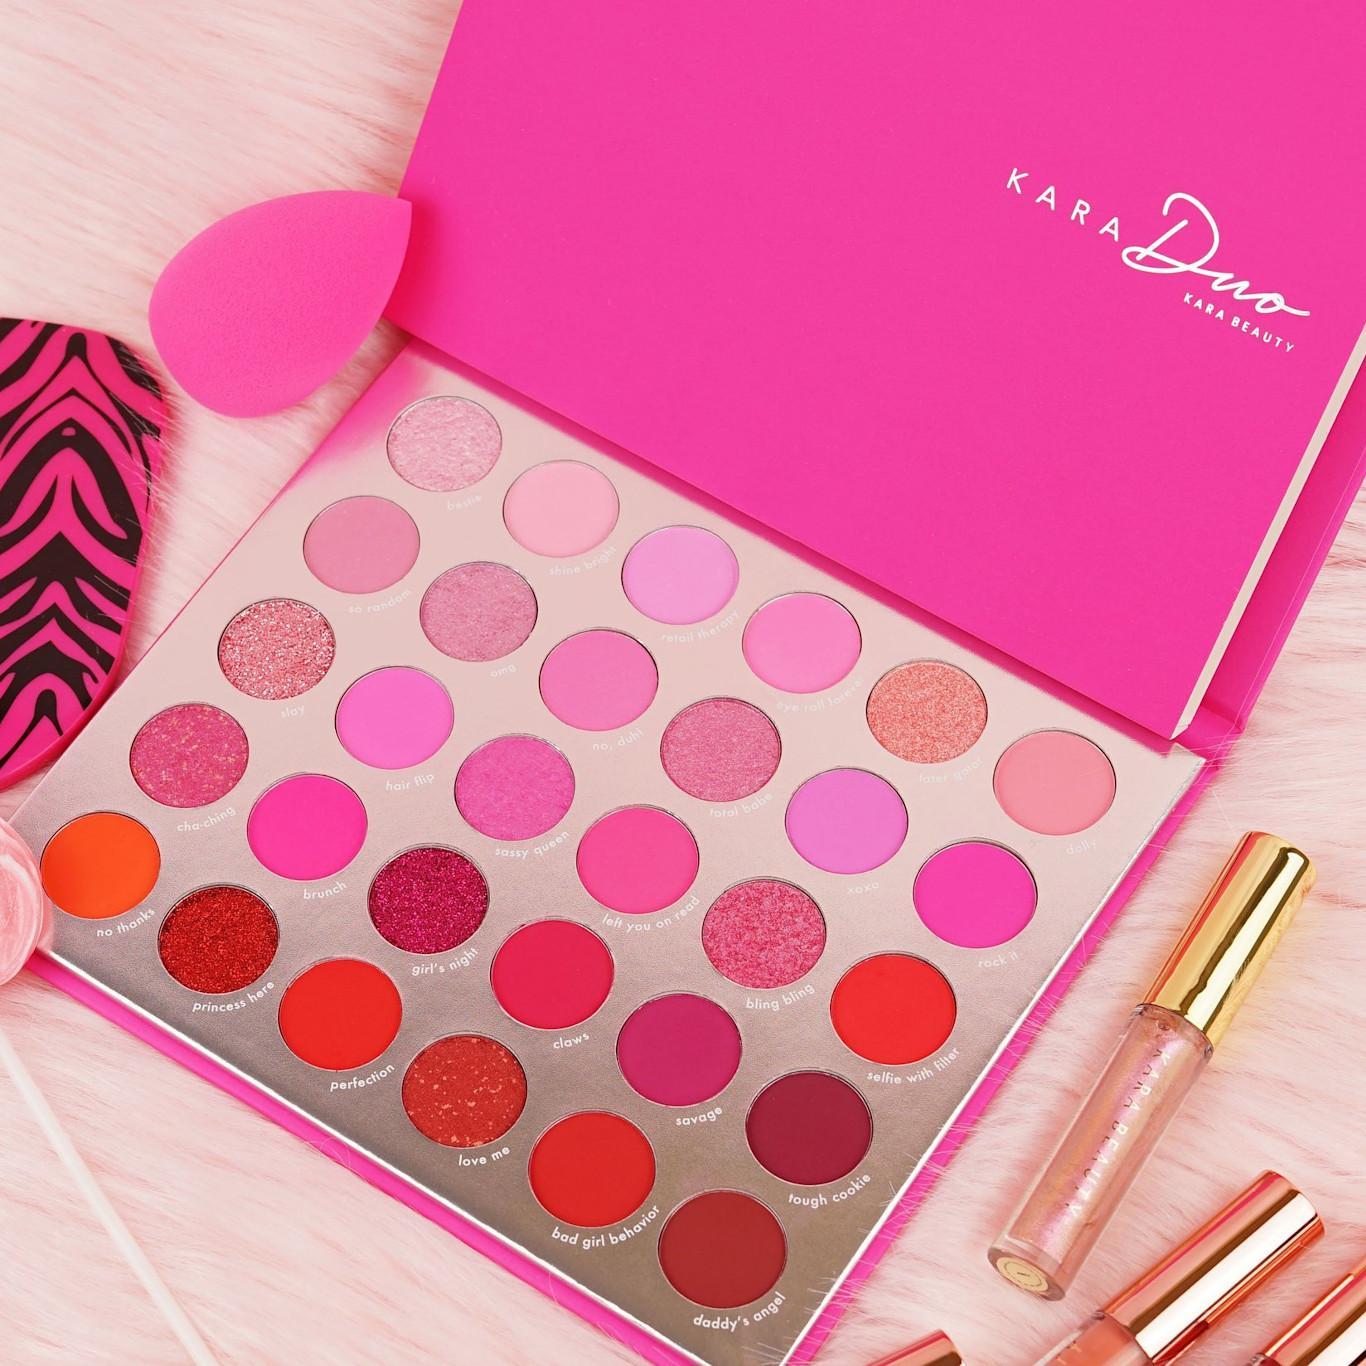 Kara Beauty PRO17 Like Totally! Shadow Palette Post Cover